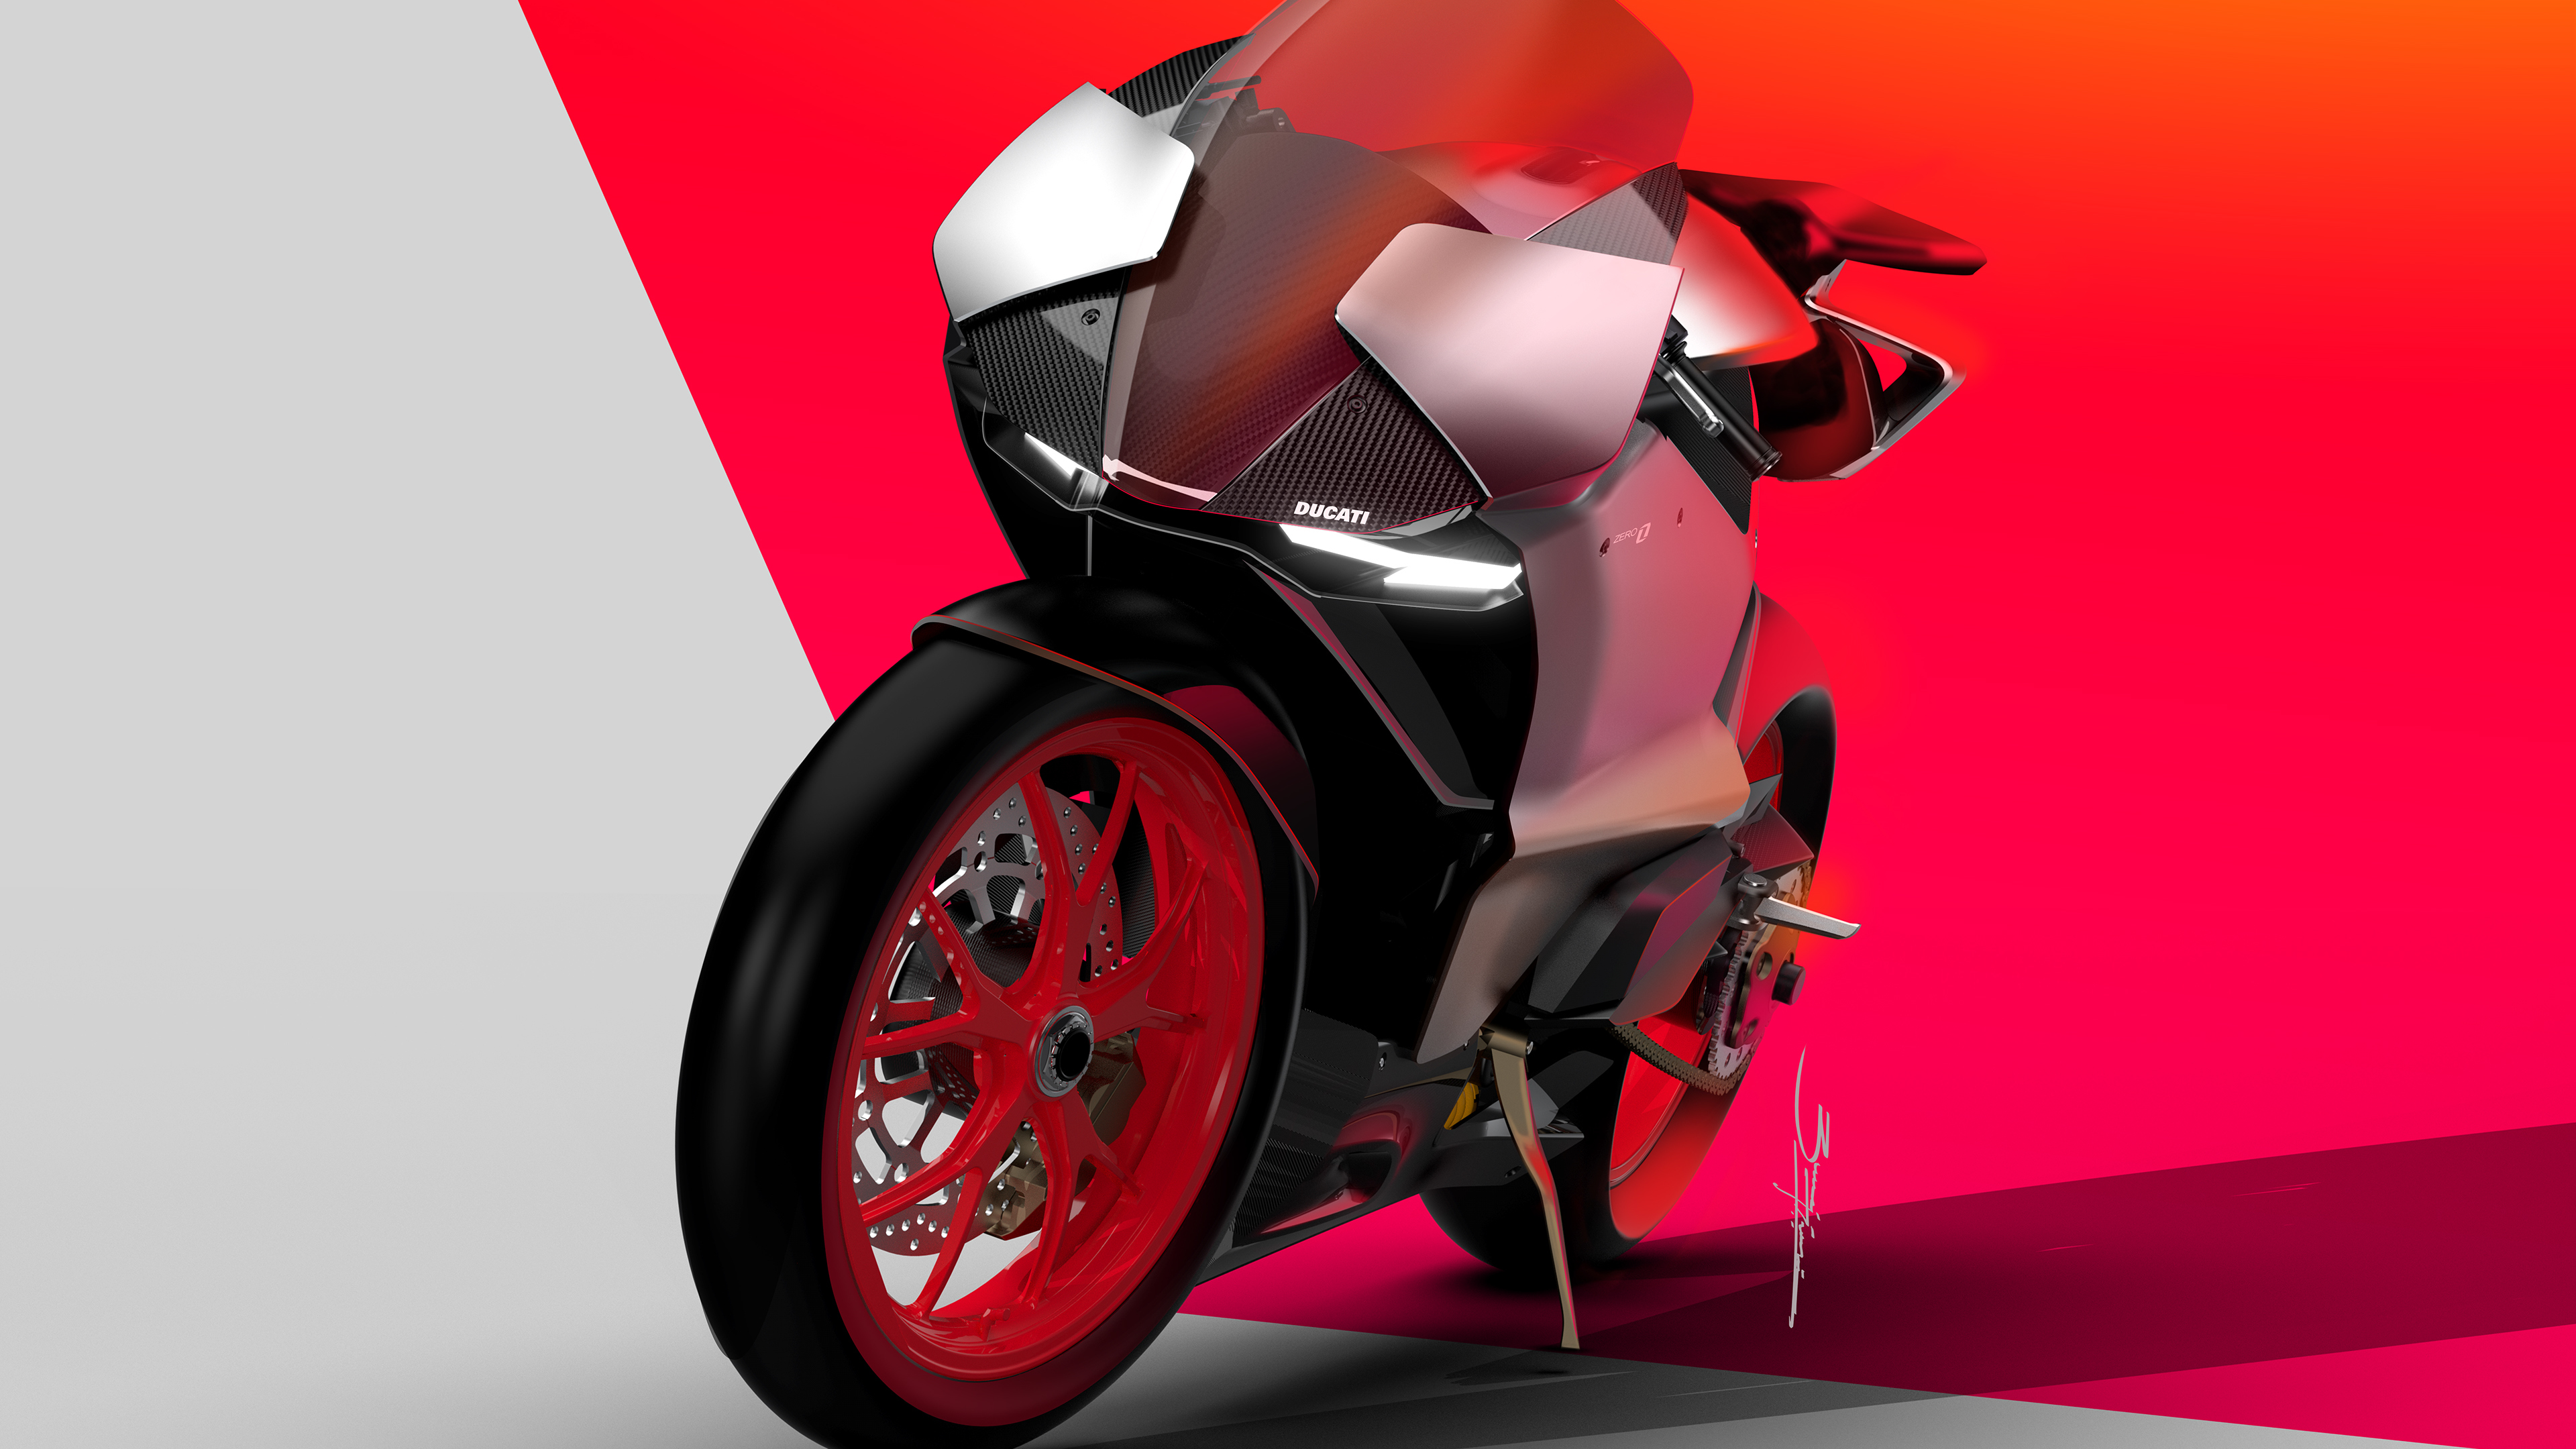 ducati zero electric 2020 1536316621 - Ducati Zero Electric 2020 - hd-wallpapers, ducati wallpapers, bikes wallpapers, behance wallpapers, artist wallpapers, 4k-wallpapers, 2020 bikes wallpapers